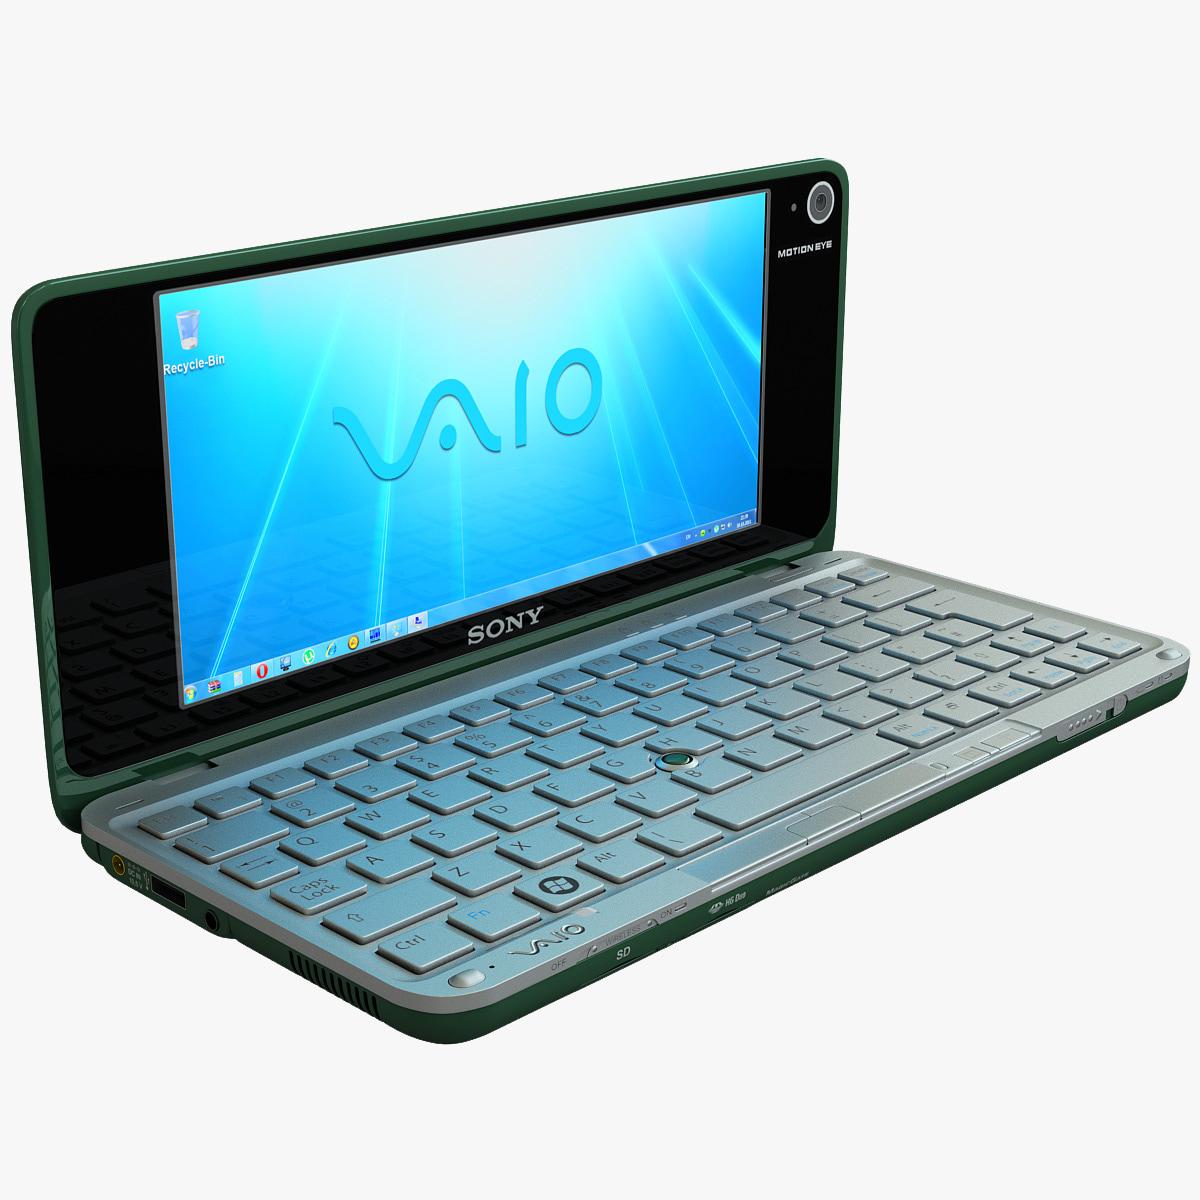 Laptop_Sony_VAIO_P_Green_000.jpg